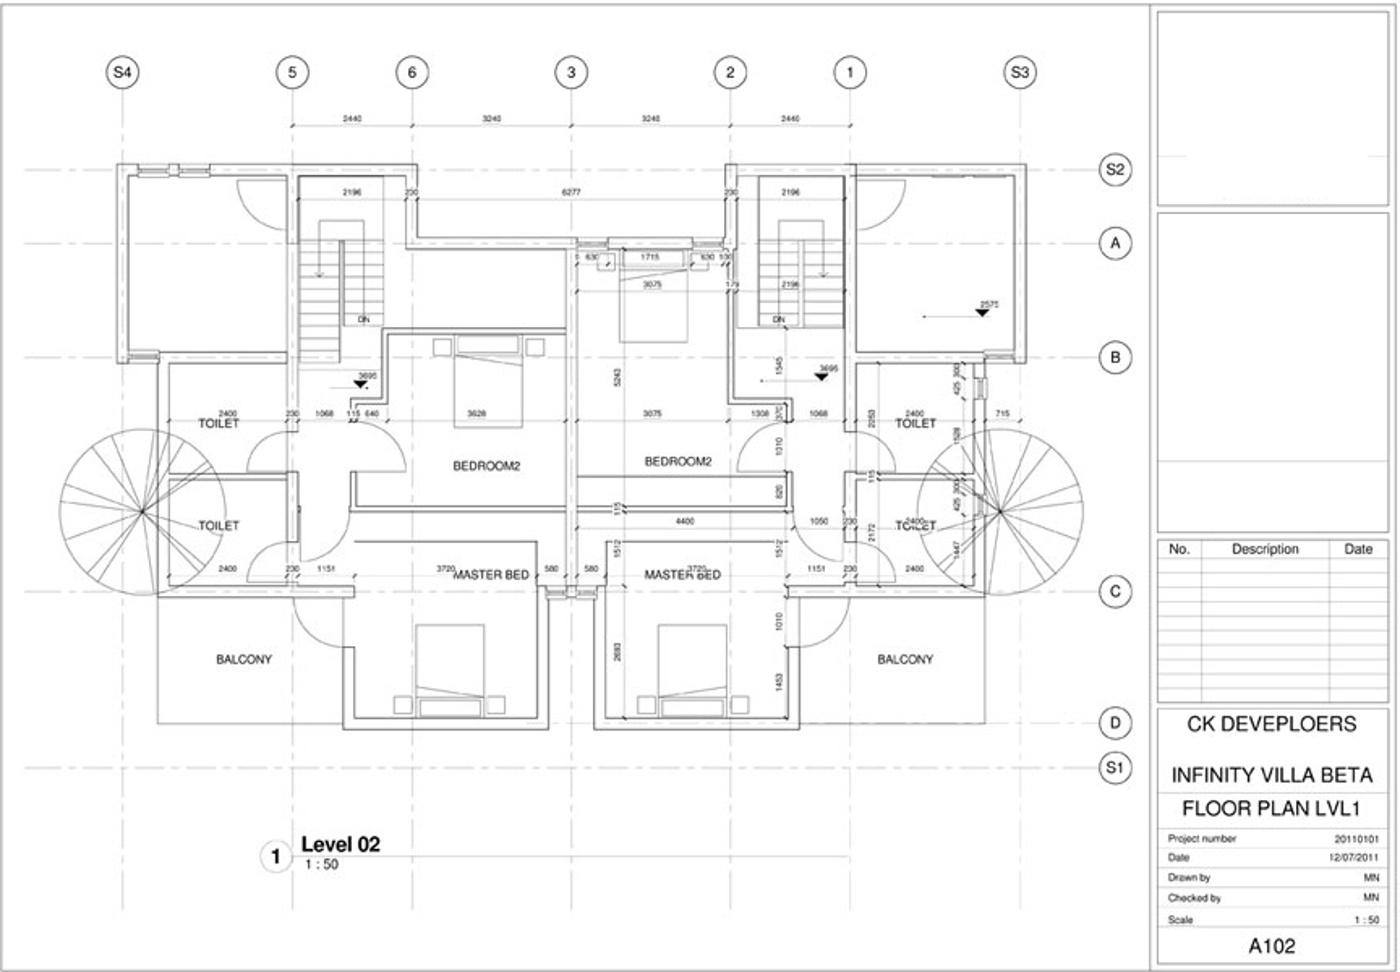 HD wallpapers floor plan synonym ahdddesignf.ga